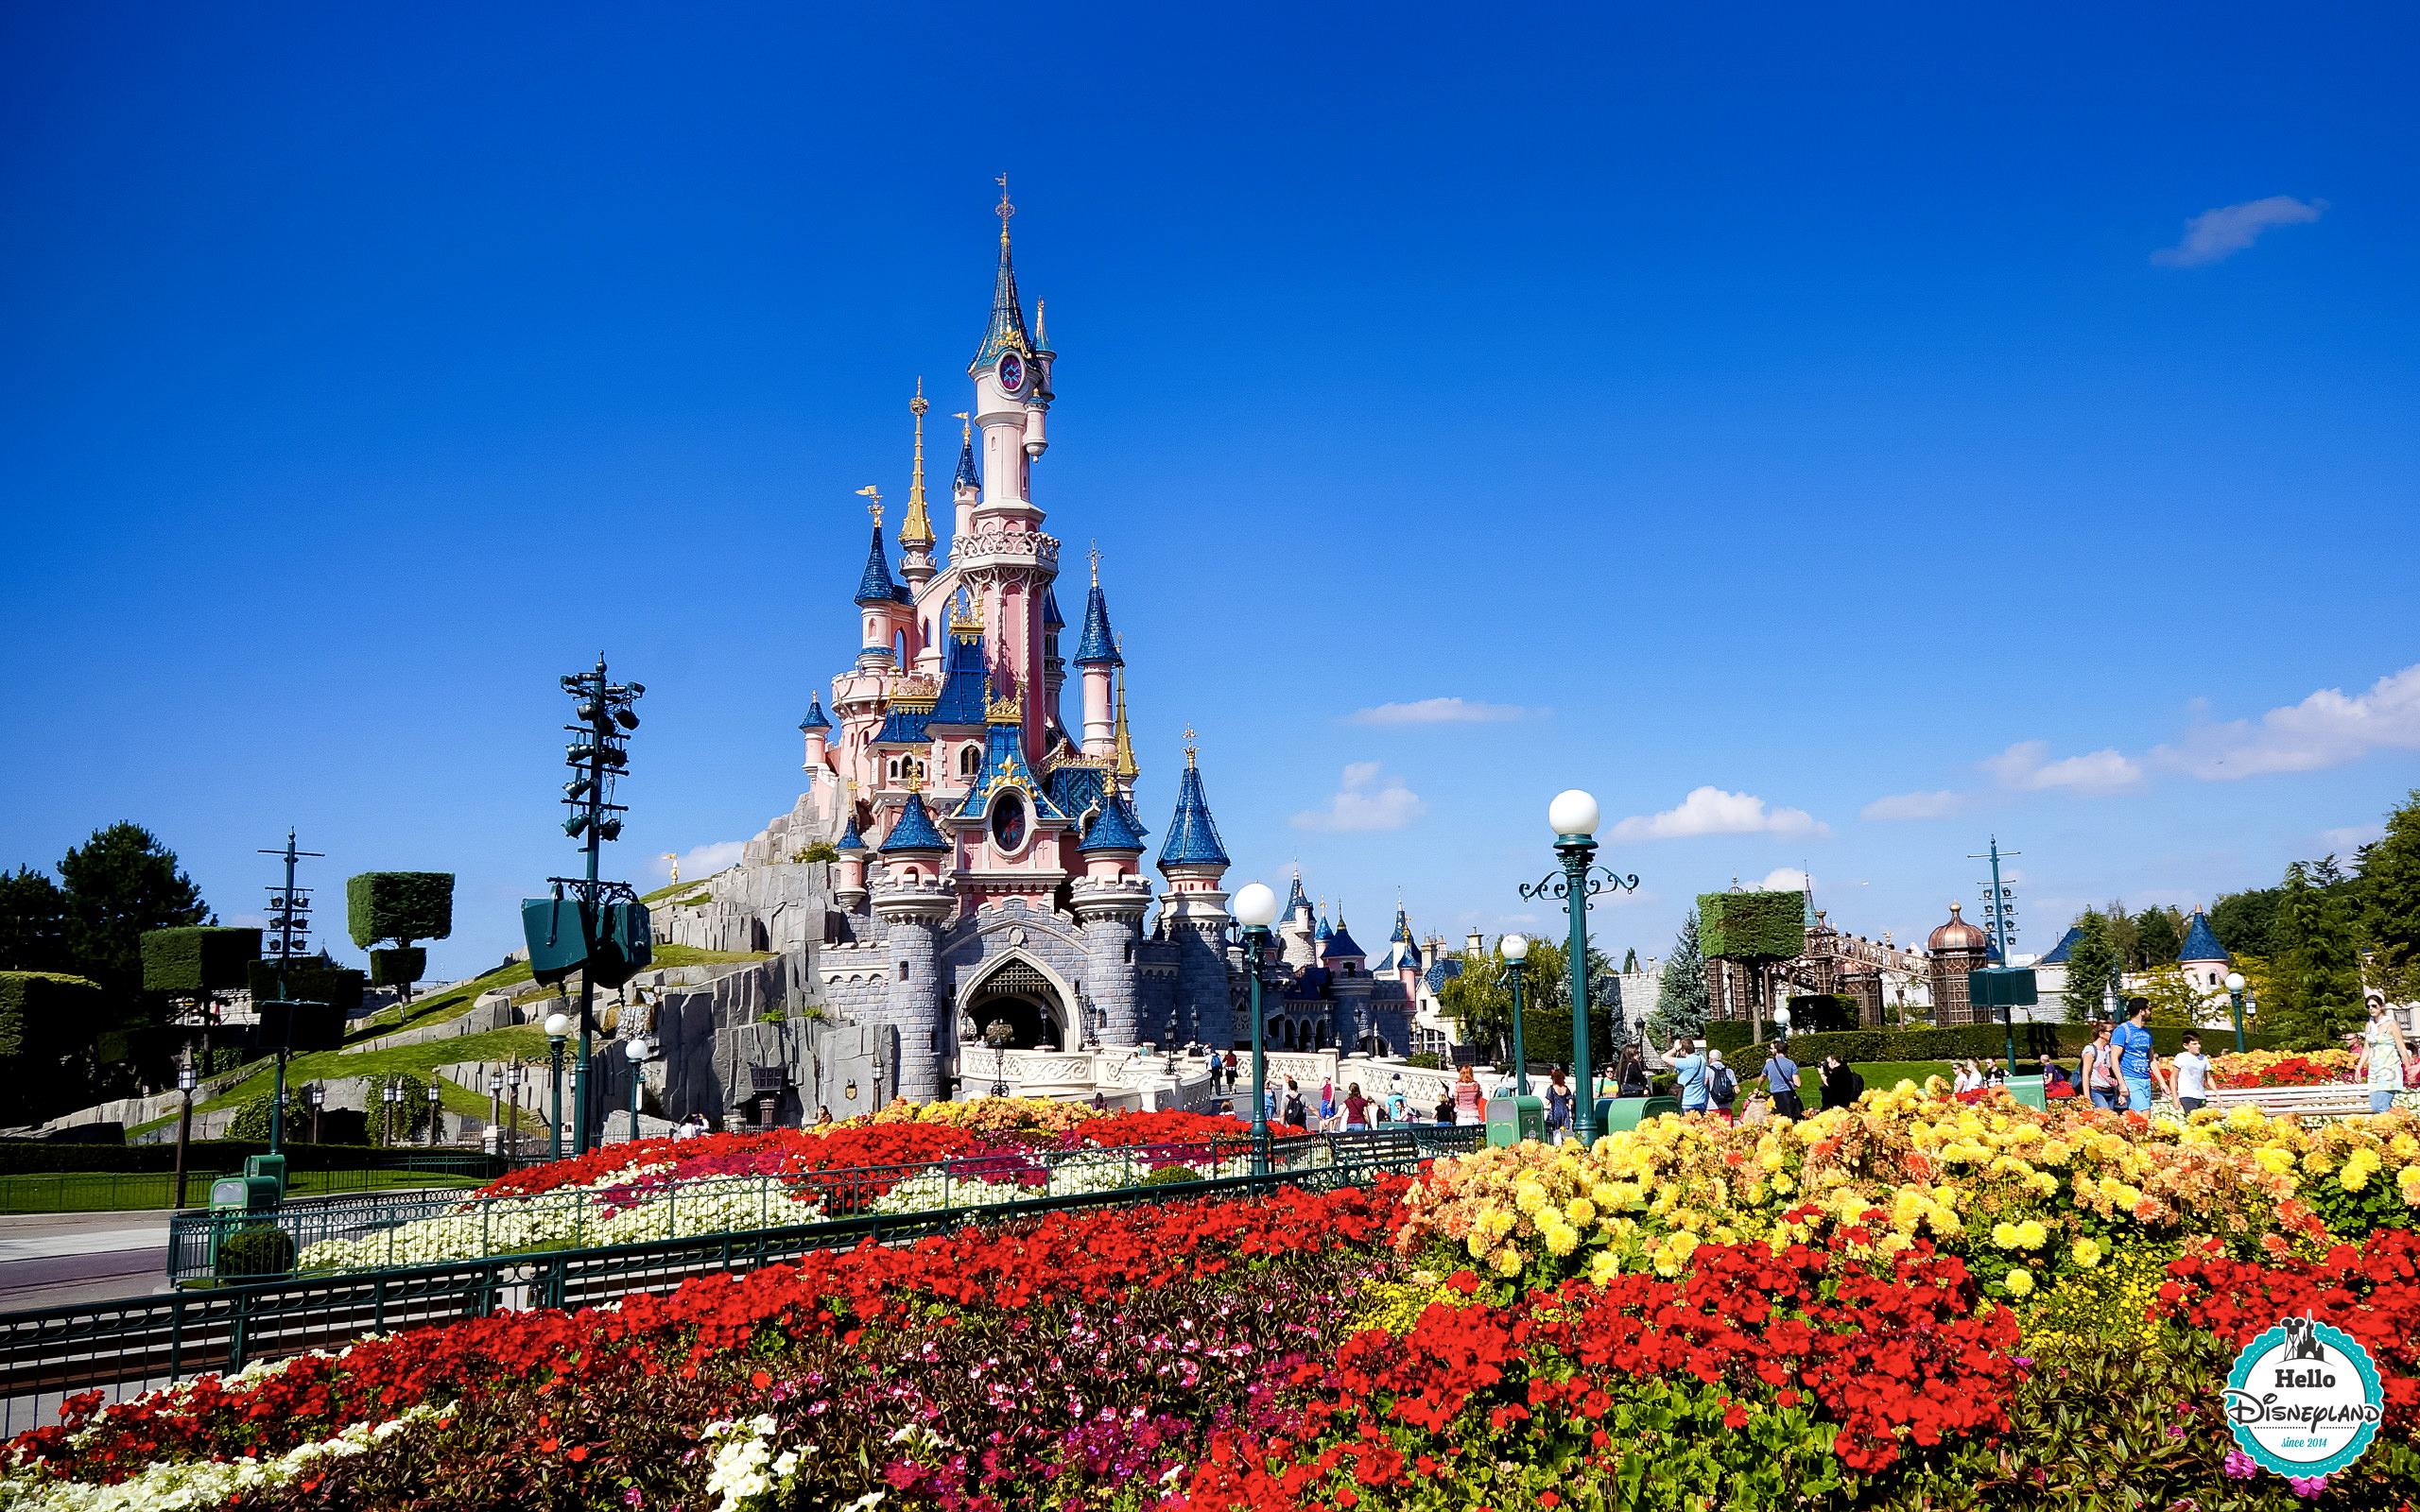 disneyland paris noel 2018 horaires Hello Disneyland : Le blog n°1 sur Disneyland Paris | Horaires d  disneyland paris noel 2018 horaires